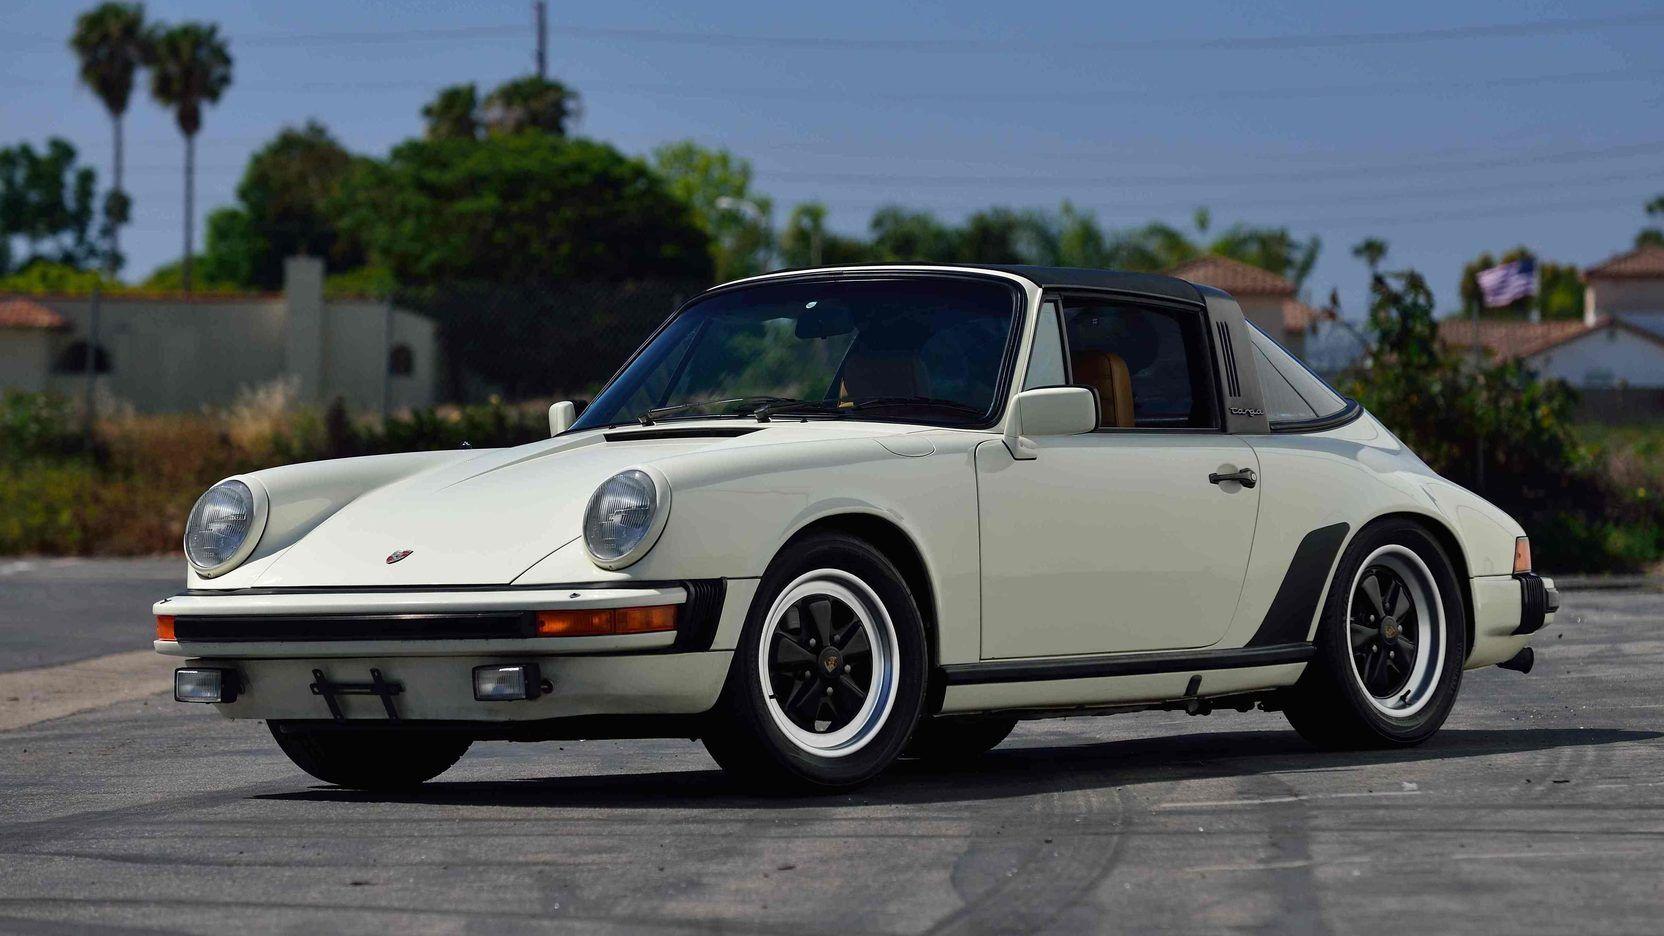 1982 Porsche 911sc Targa 1 Print Image Sold No Reserve For 35k Porsche Vintage Porsche Porsche 911 Targa